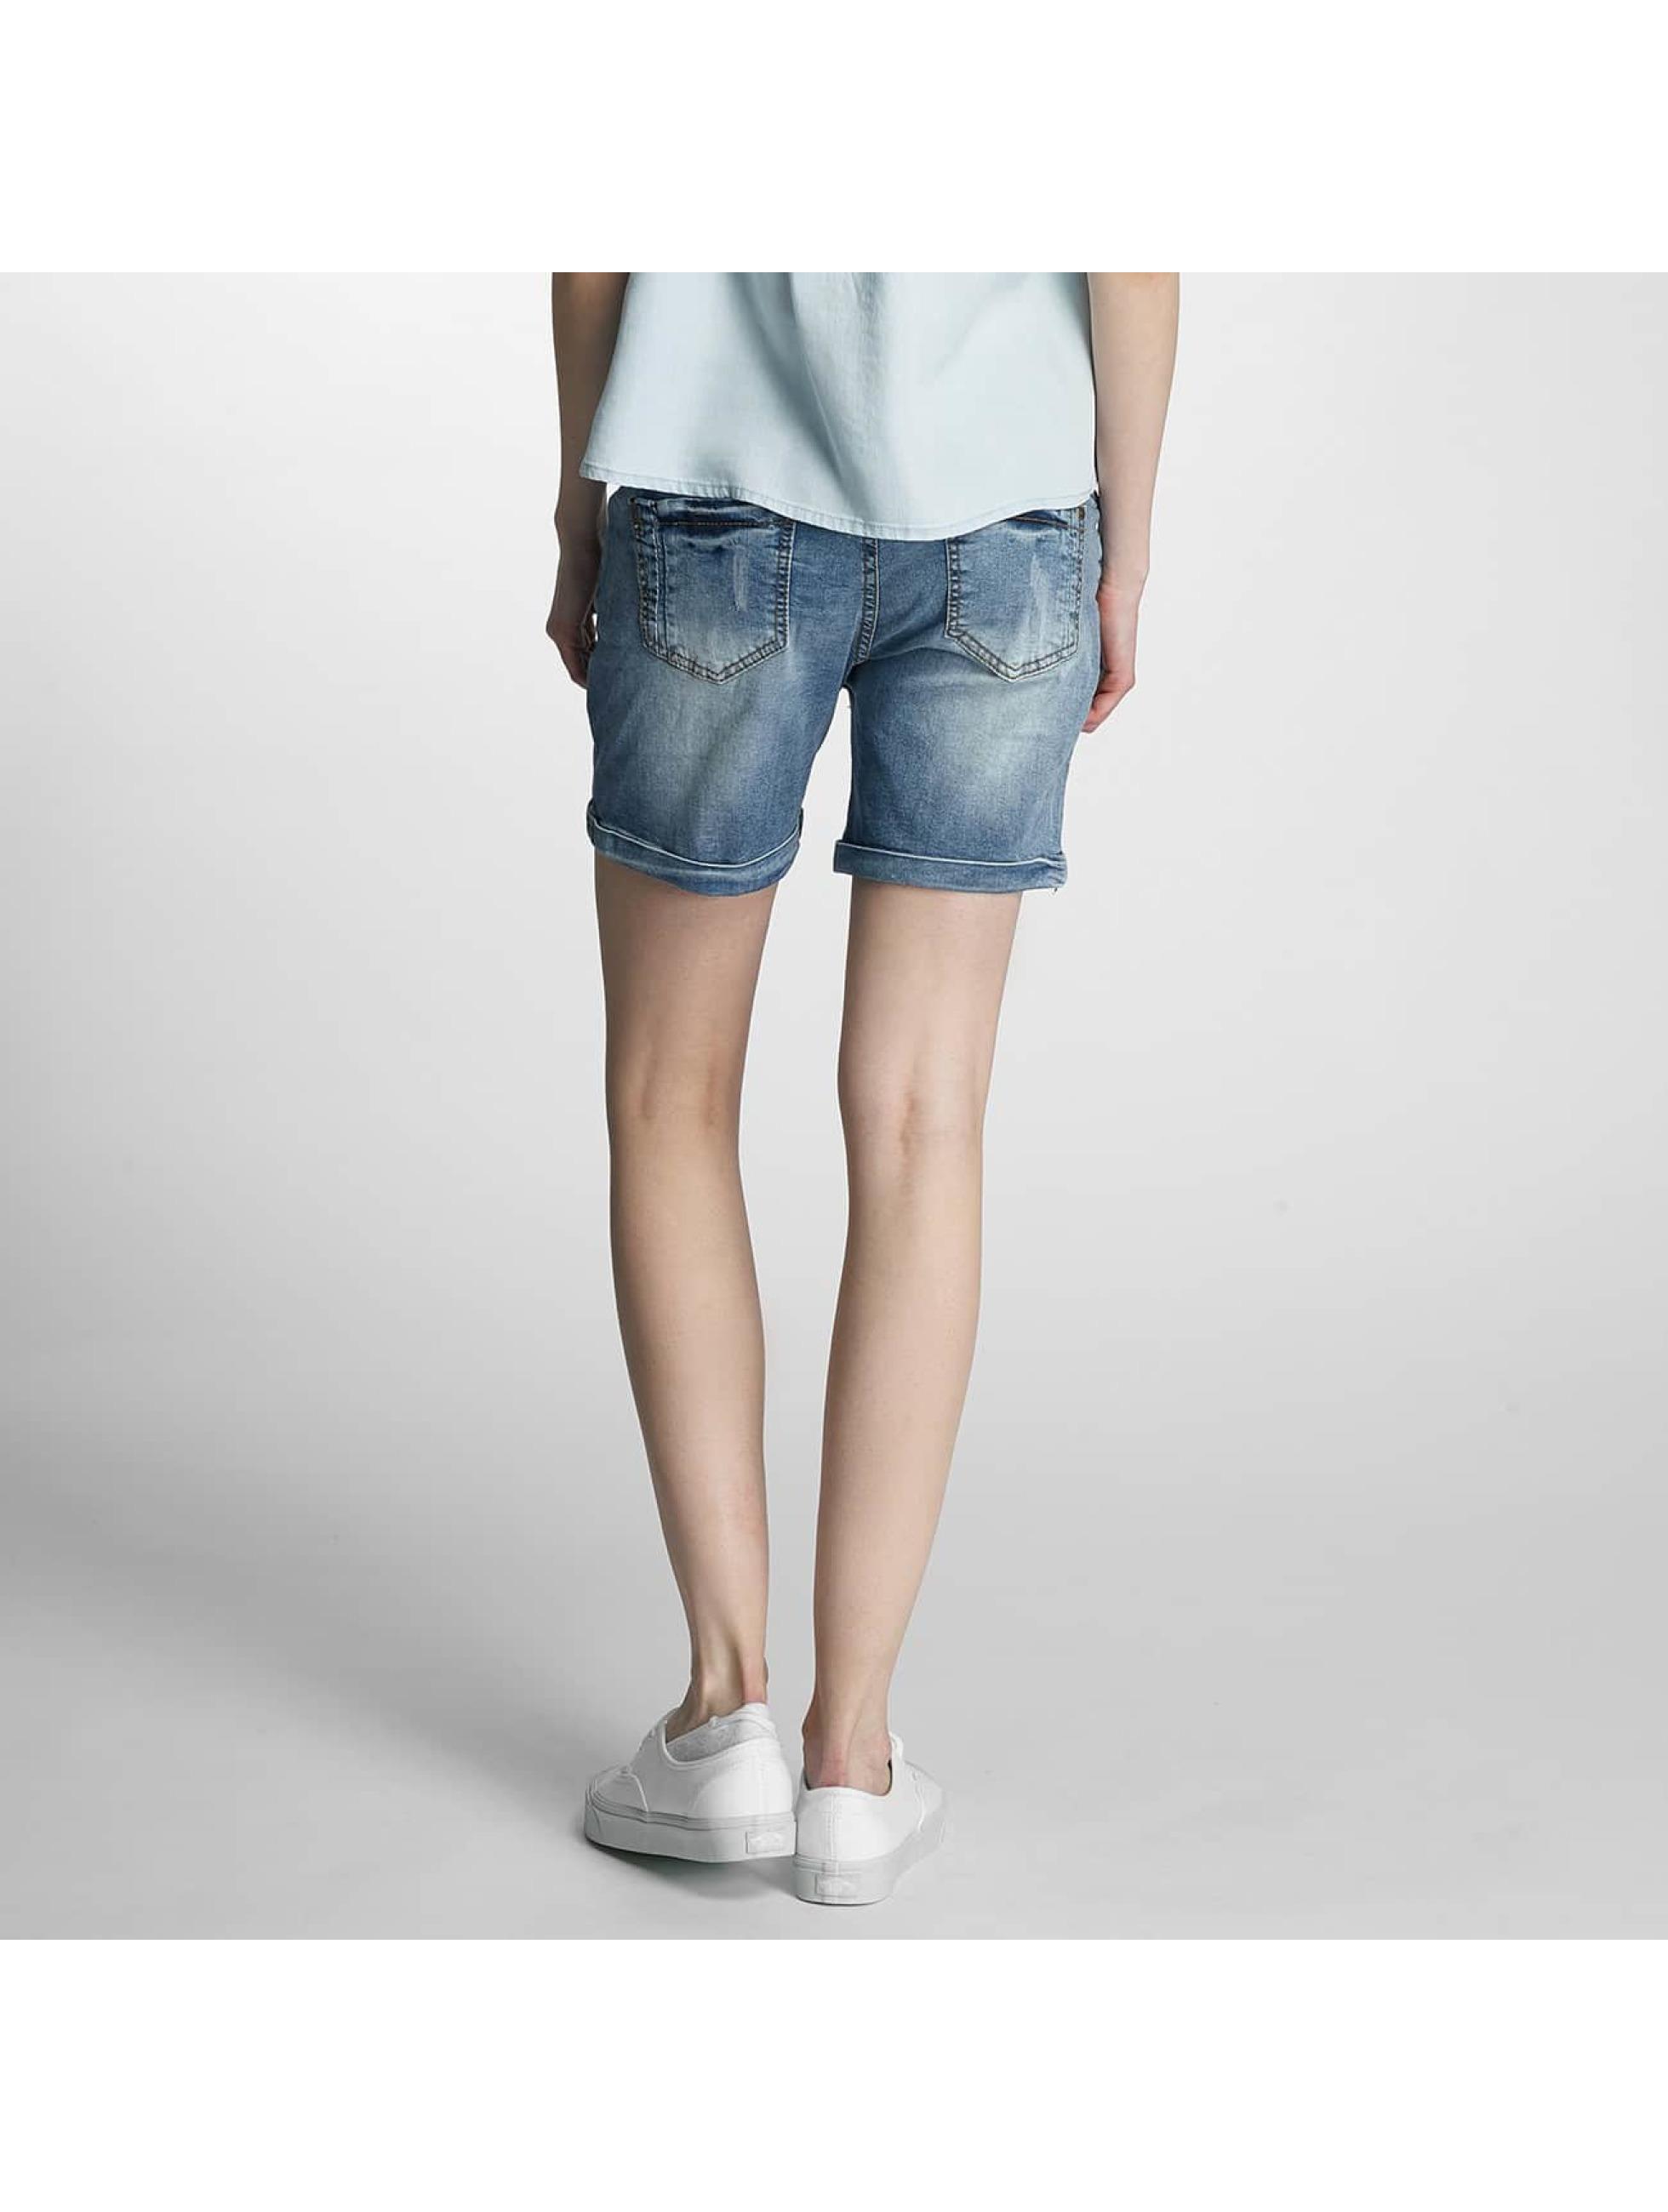 Rock Angel Pantalón cortos Hailey Bermuda azul